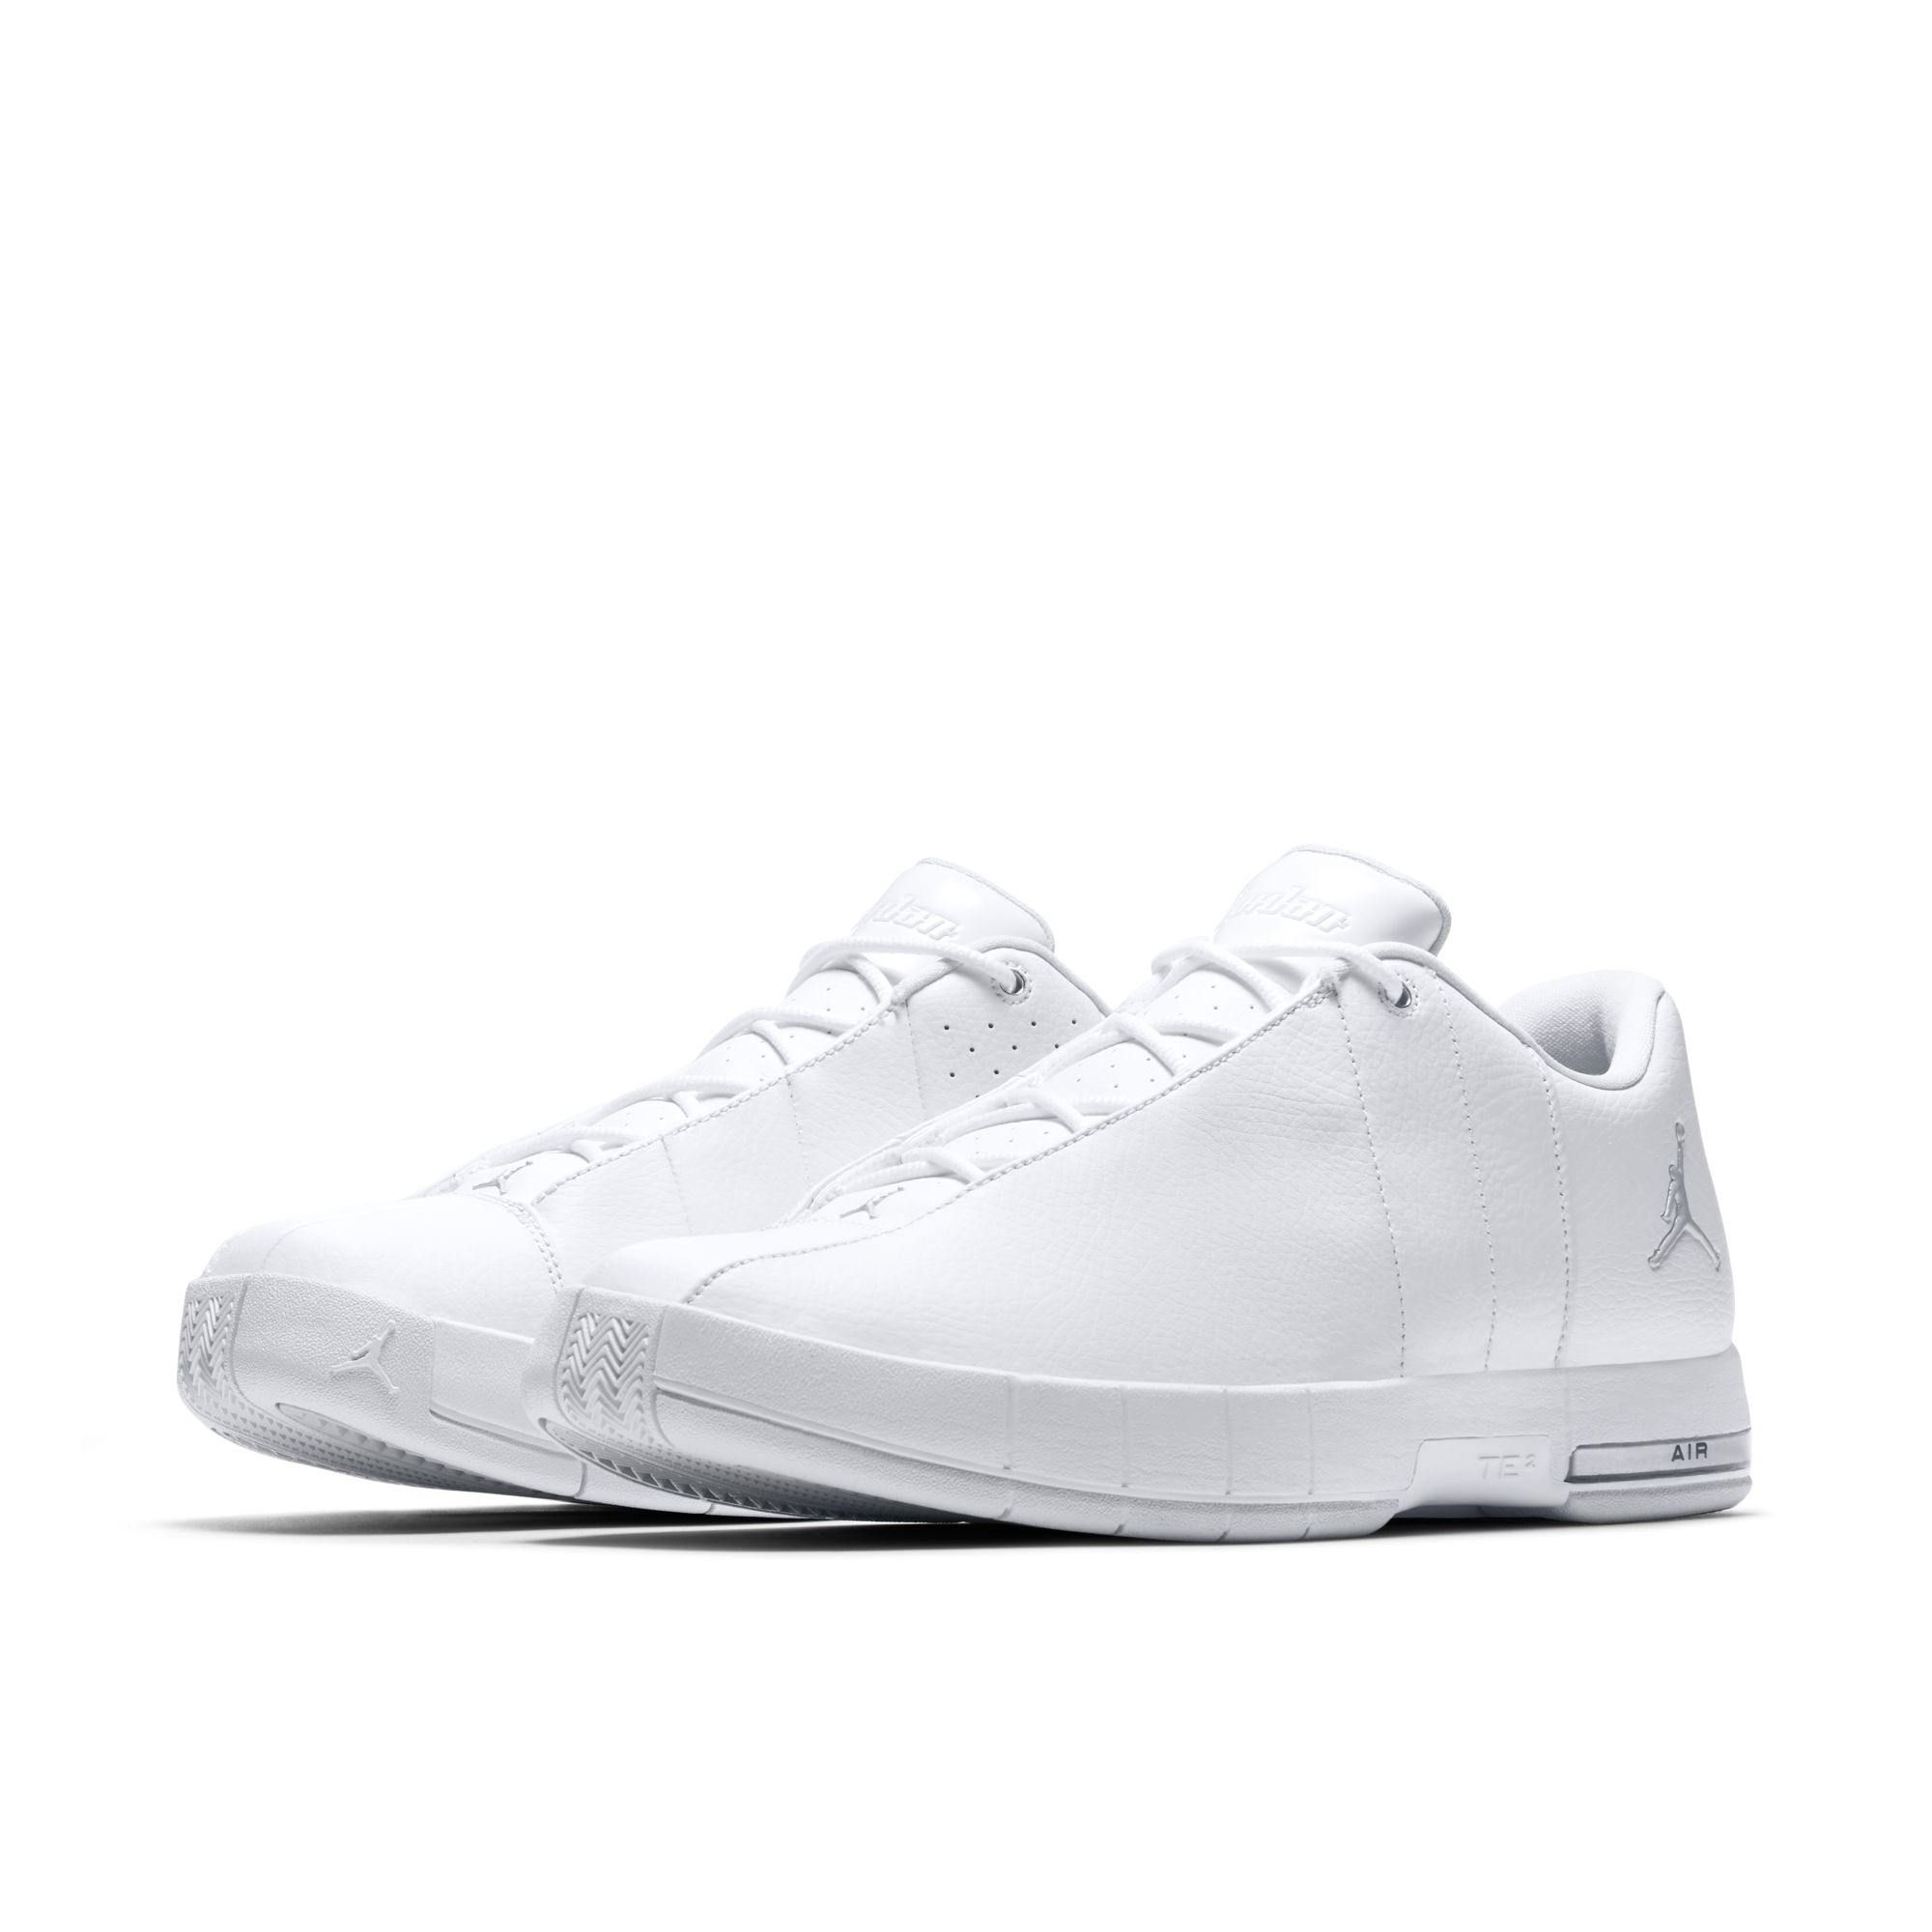 2ea77ba5191642 Jordan-Team-Elite-2-Low-White-4 - WearTesters